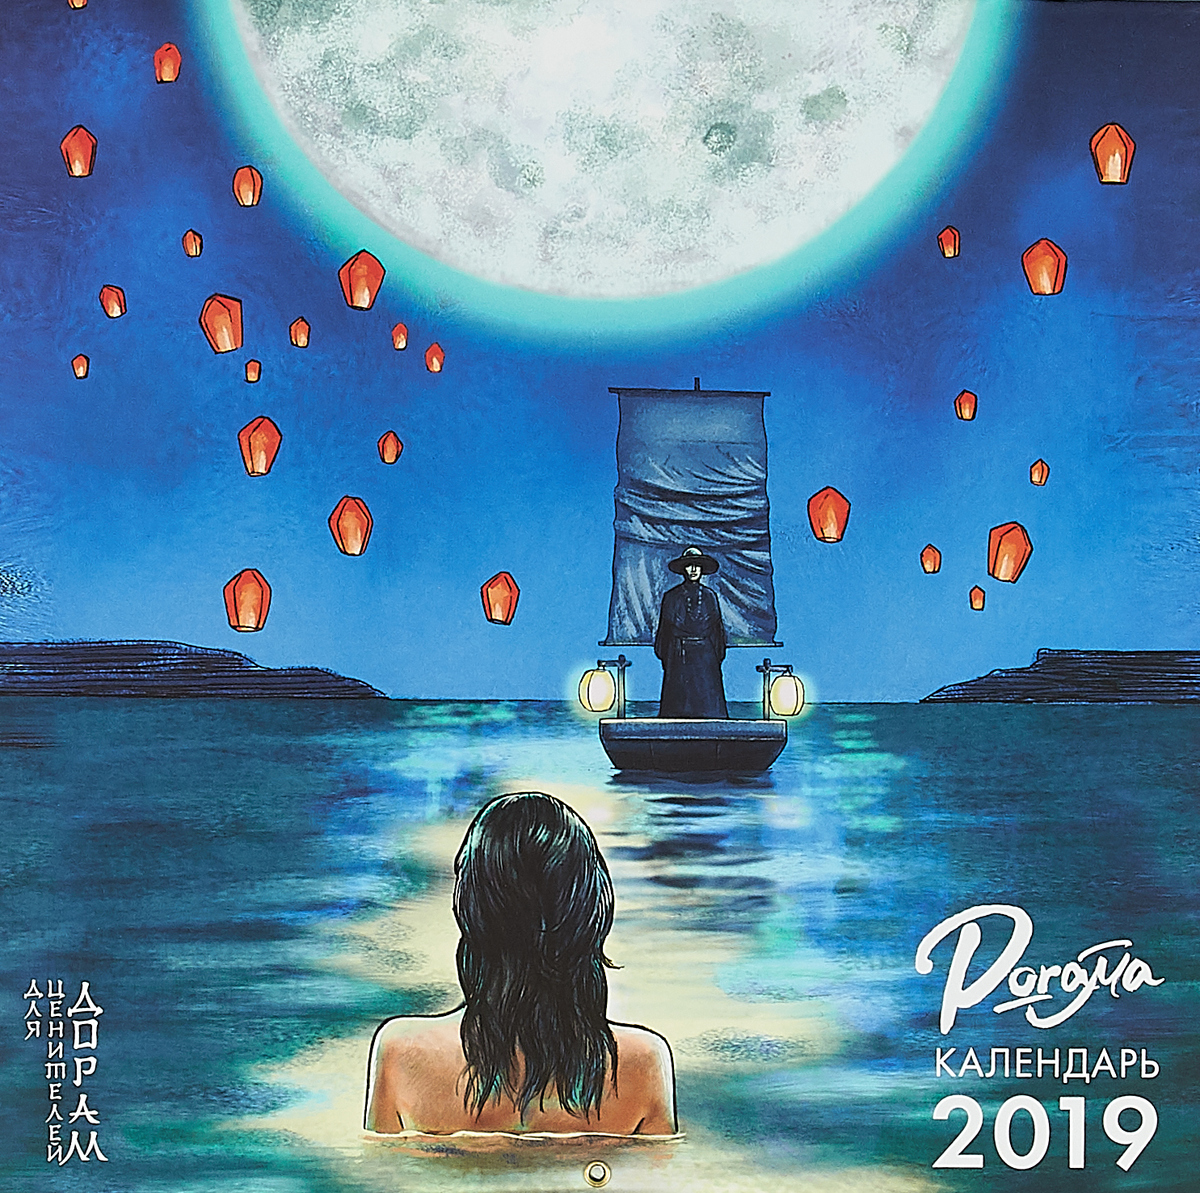 Dorama-календарь на 2019 год